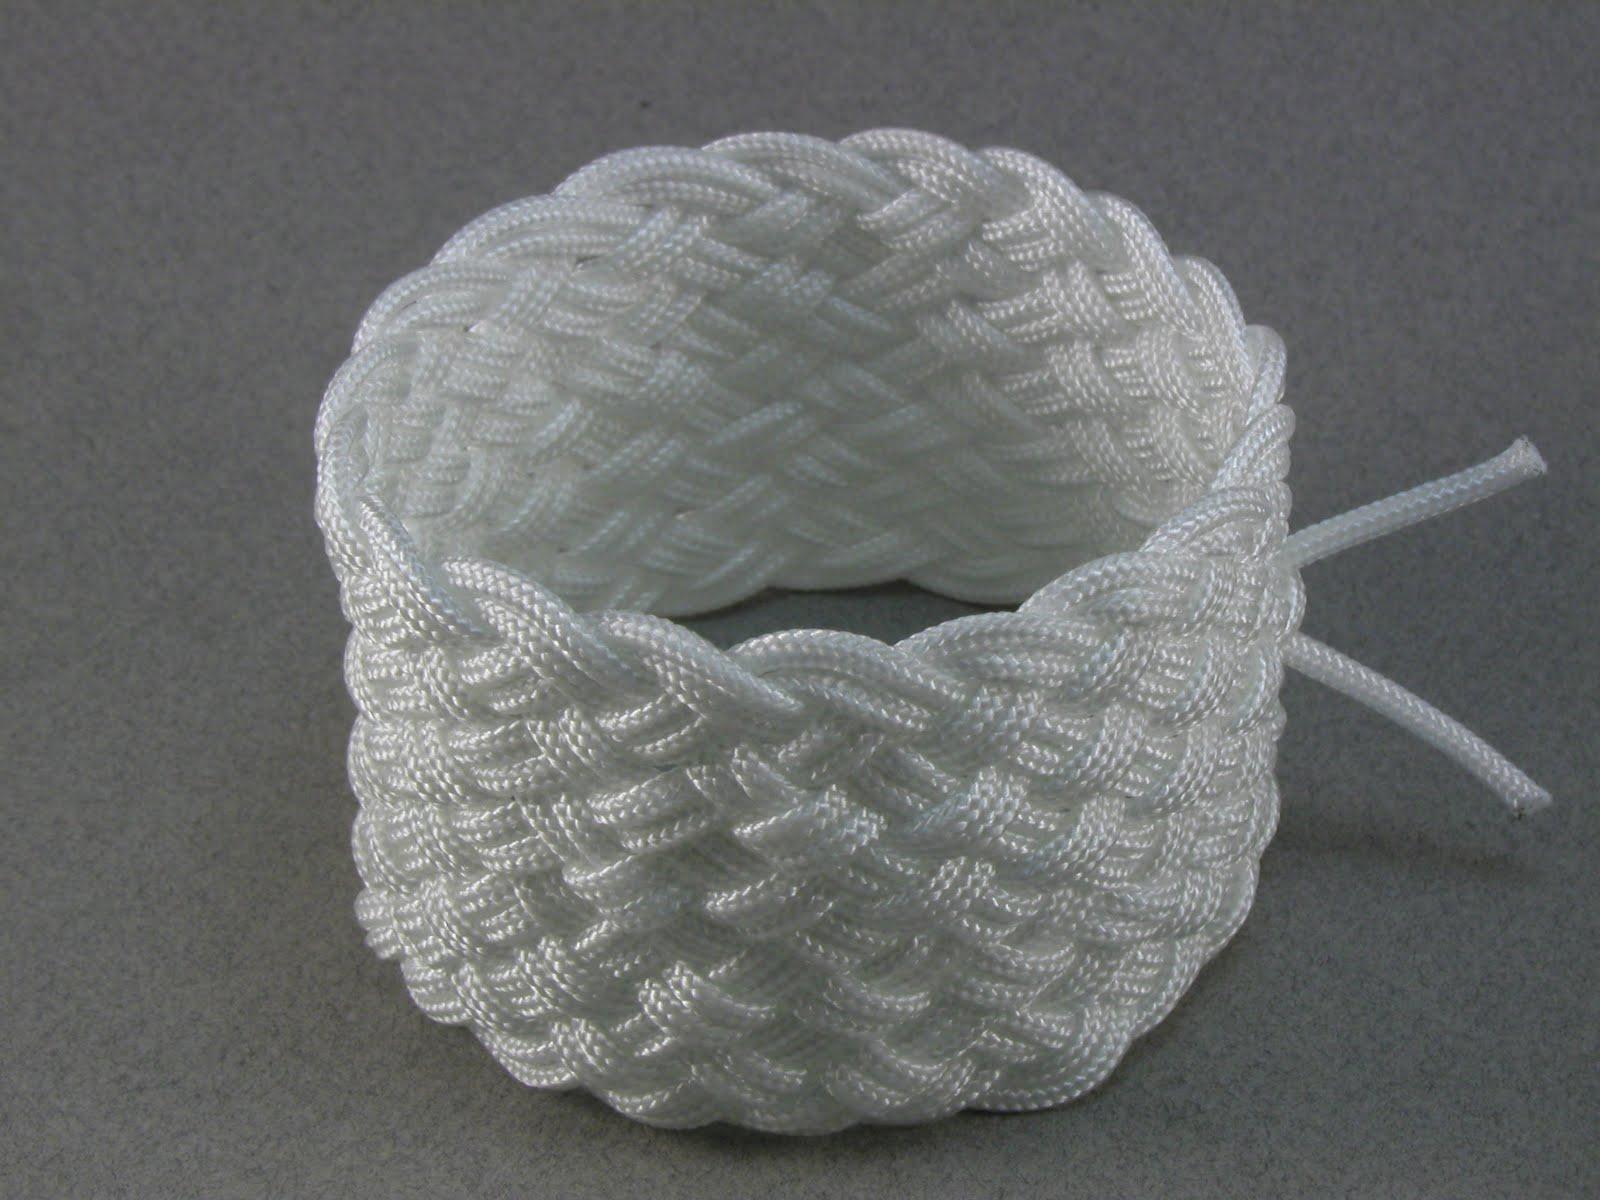 The Laboratory Nylon Fibers Consist 56